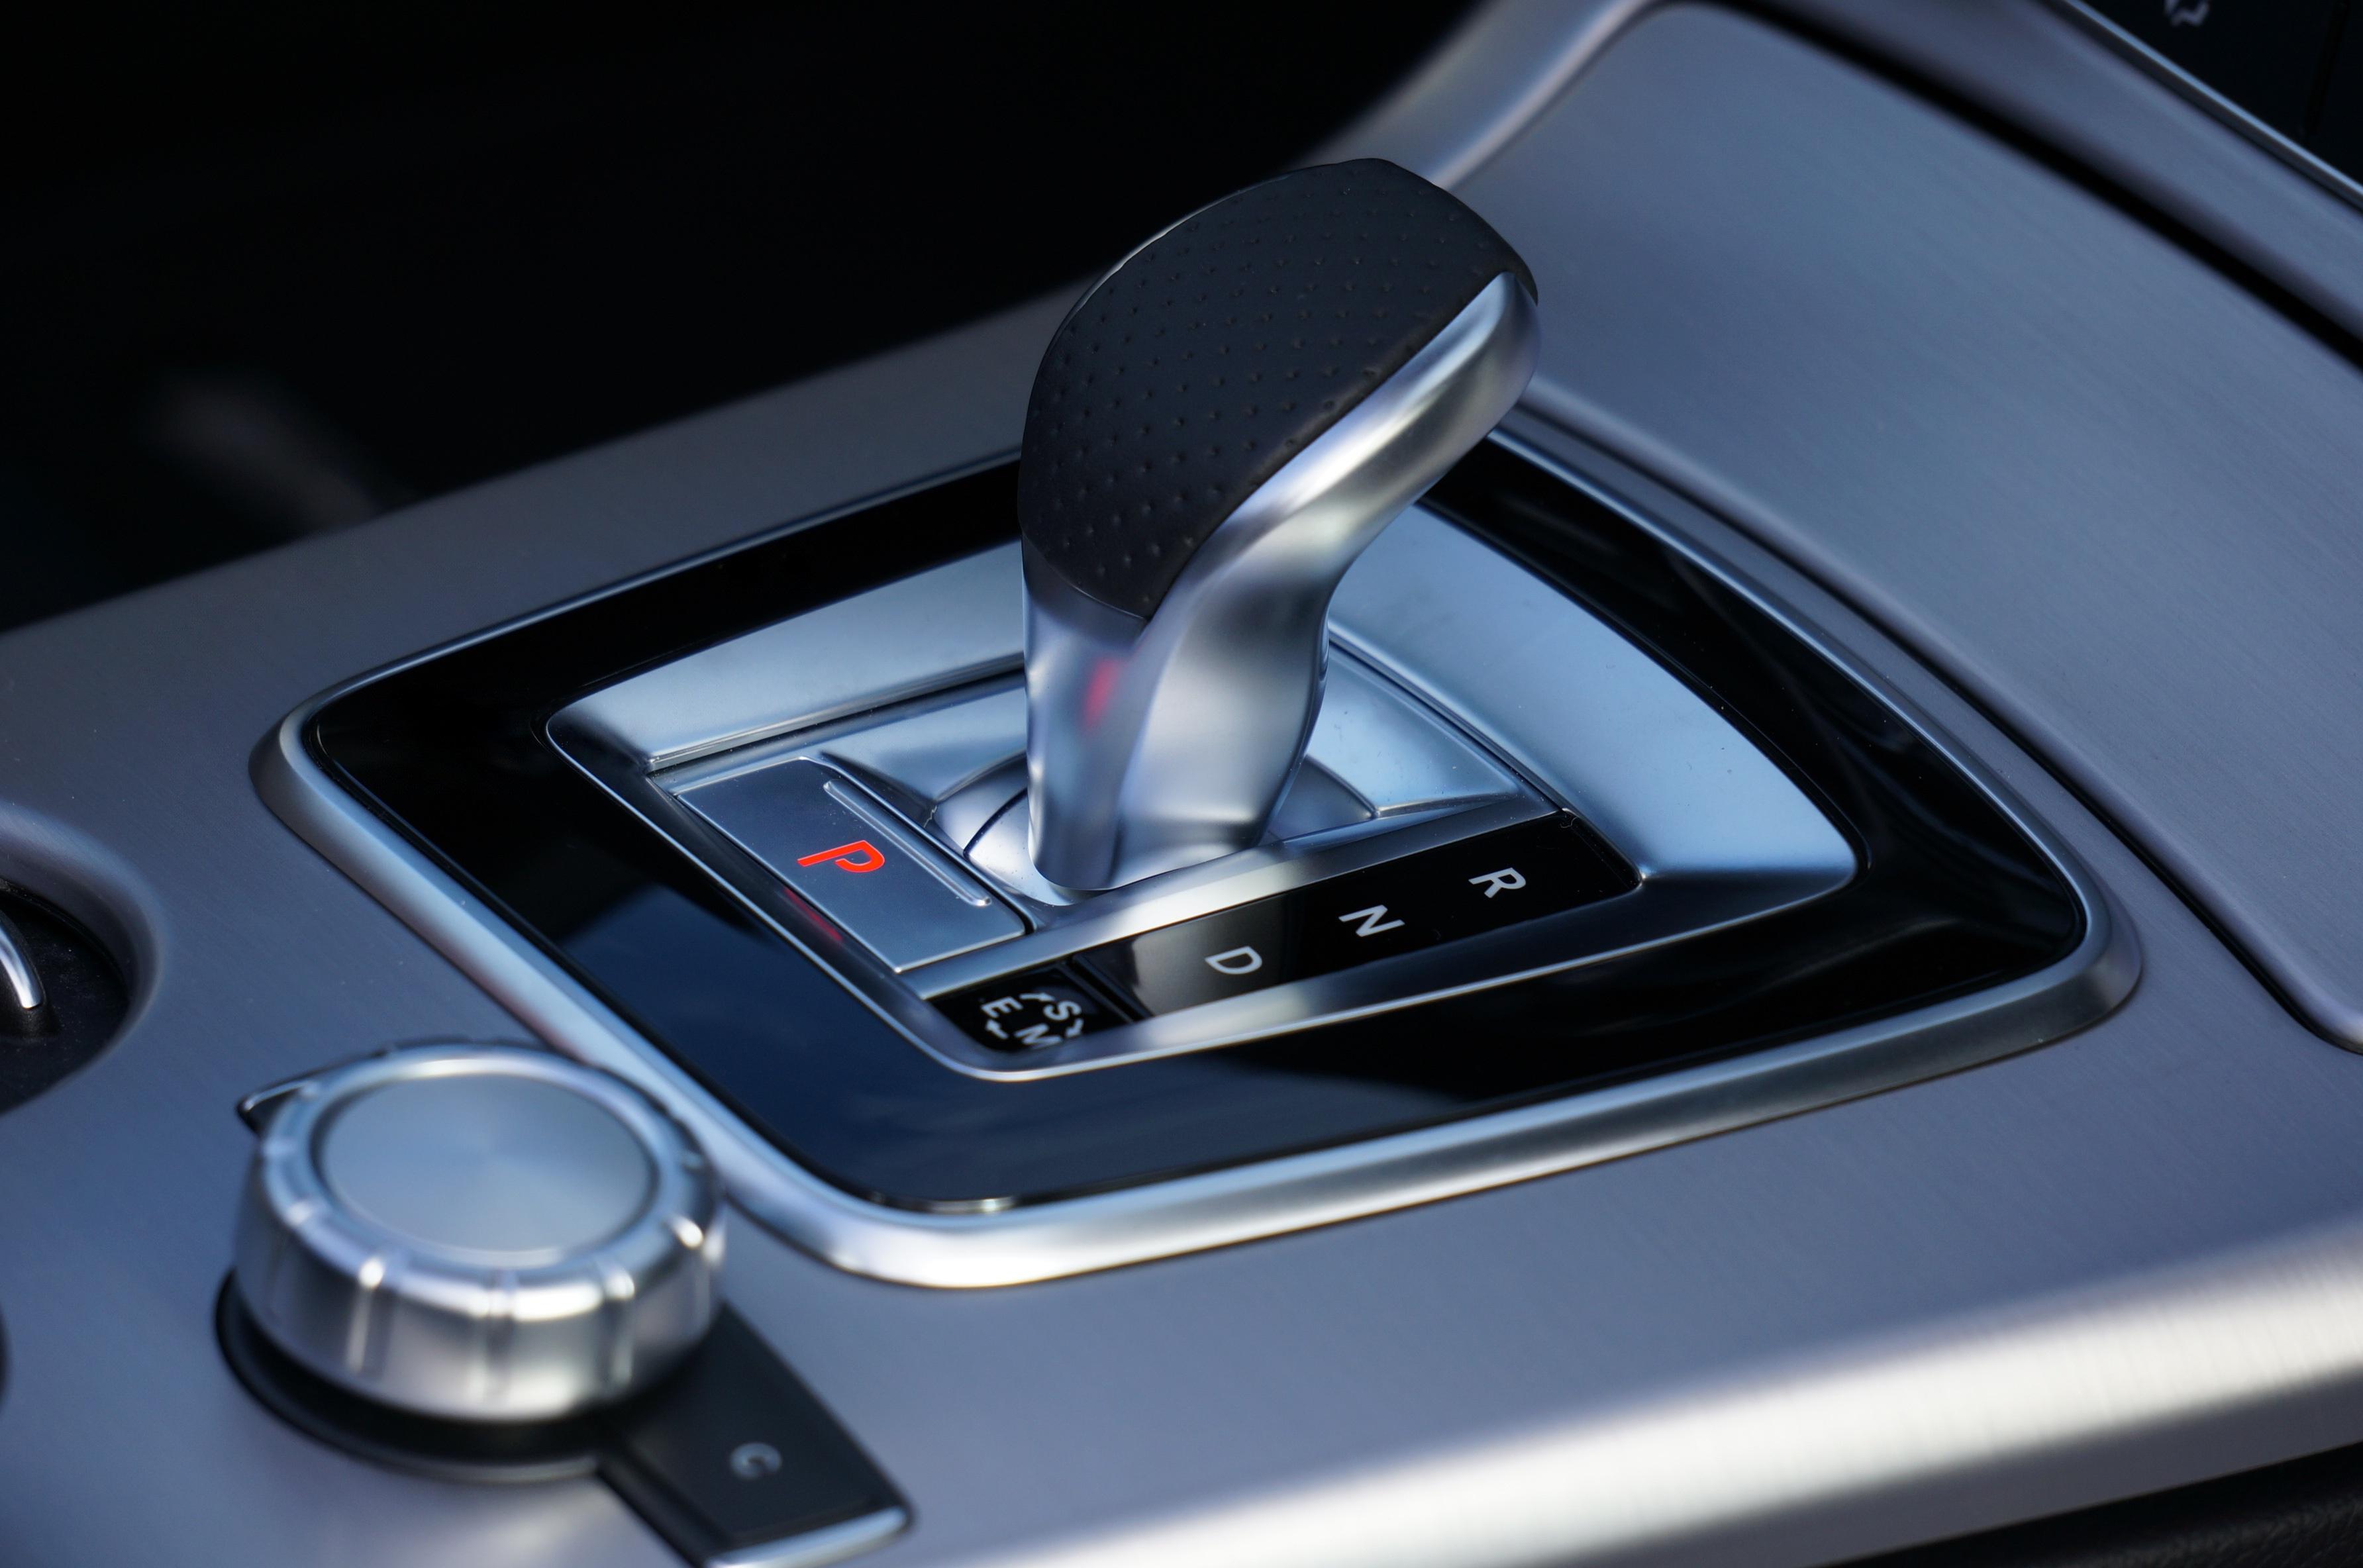 Gratis Afbeeldingen : technologie, auto, wiel, auto-, interieur ...